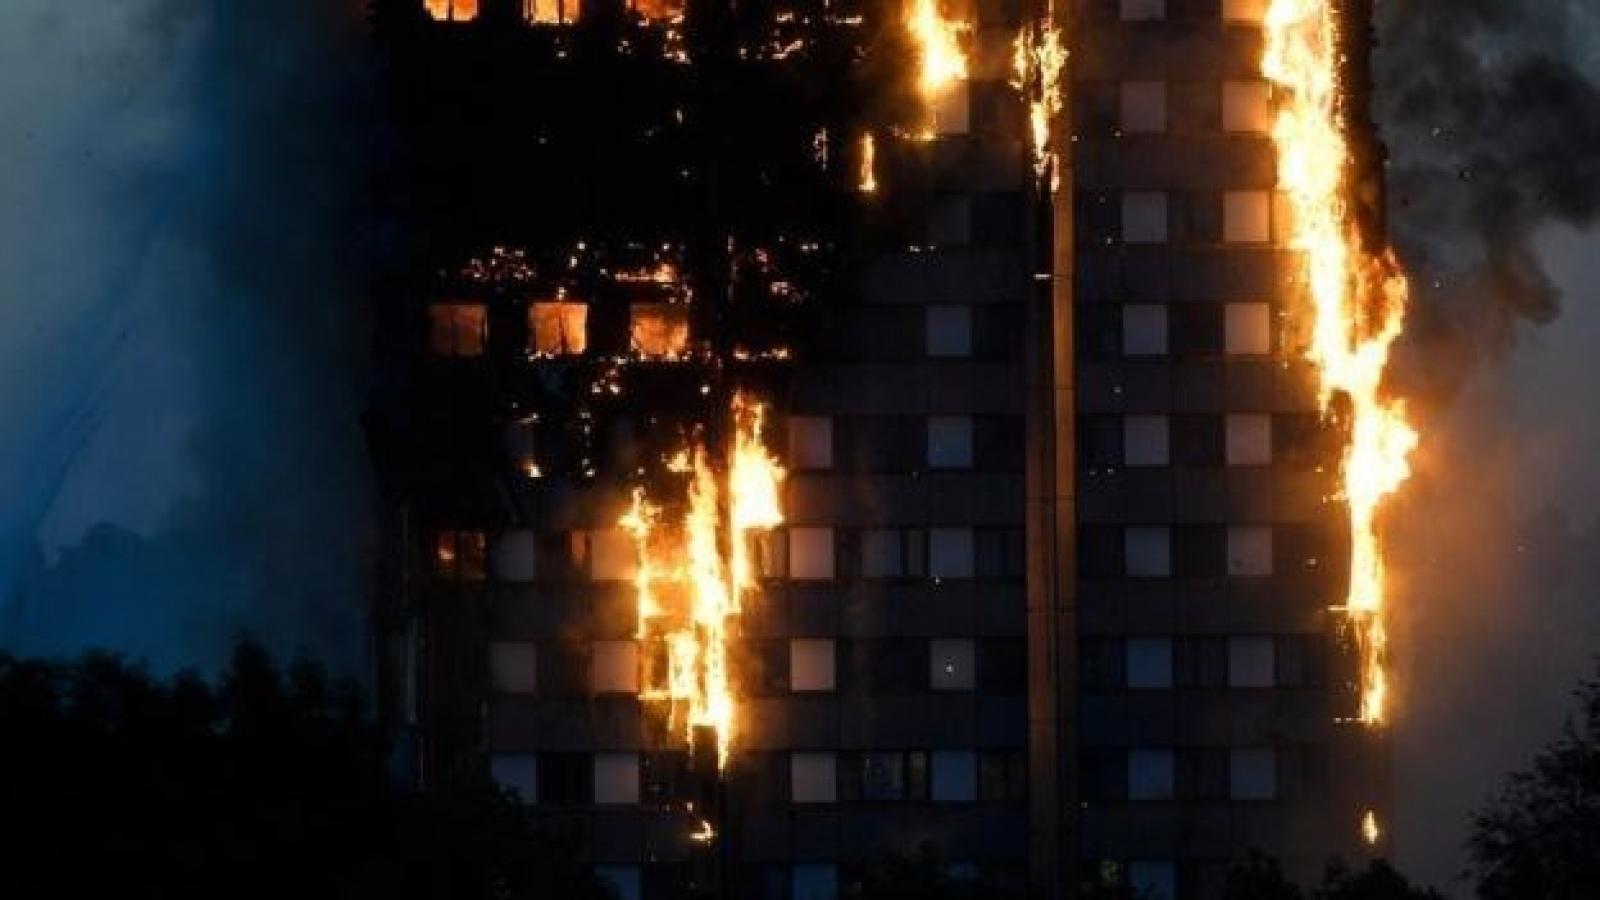 No Vietnamese victim in fire in London